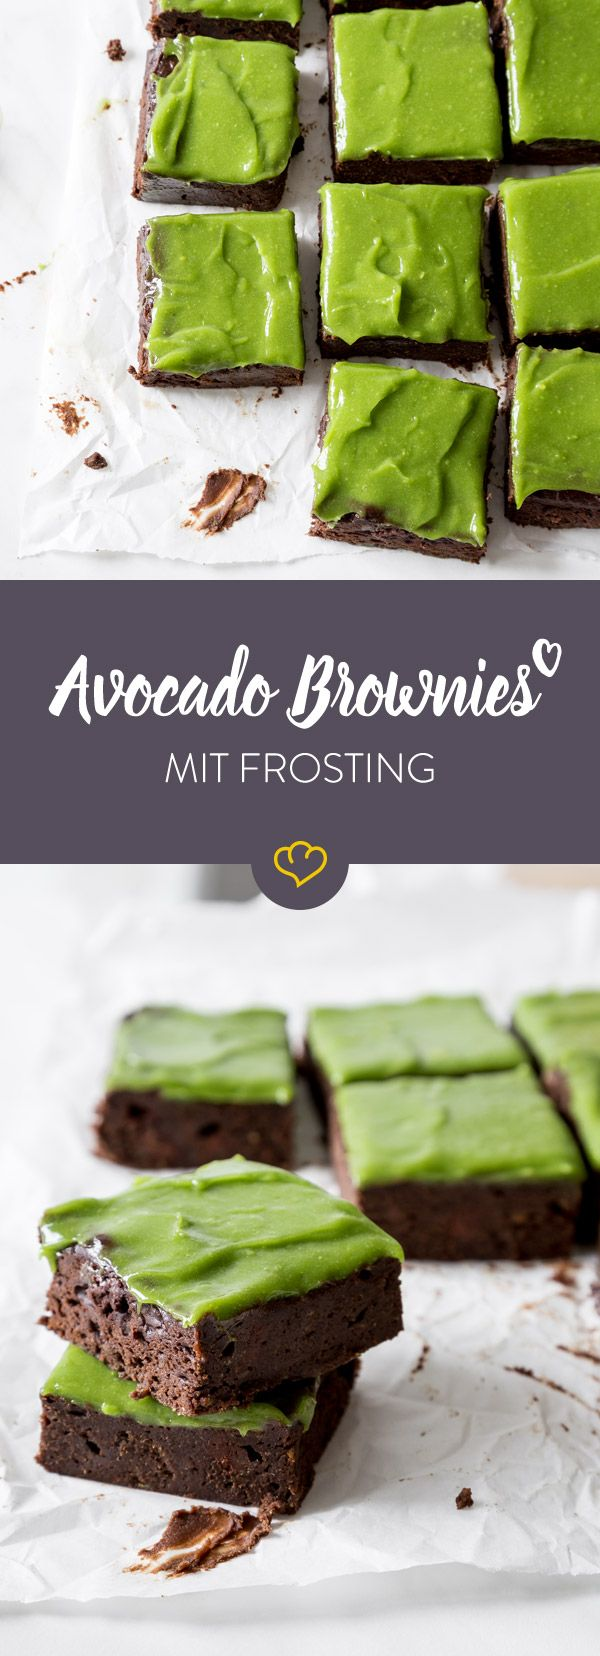 Avocado Brownies mit Frosting – schokoladig, fudgy, grün #frostings